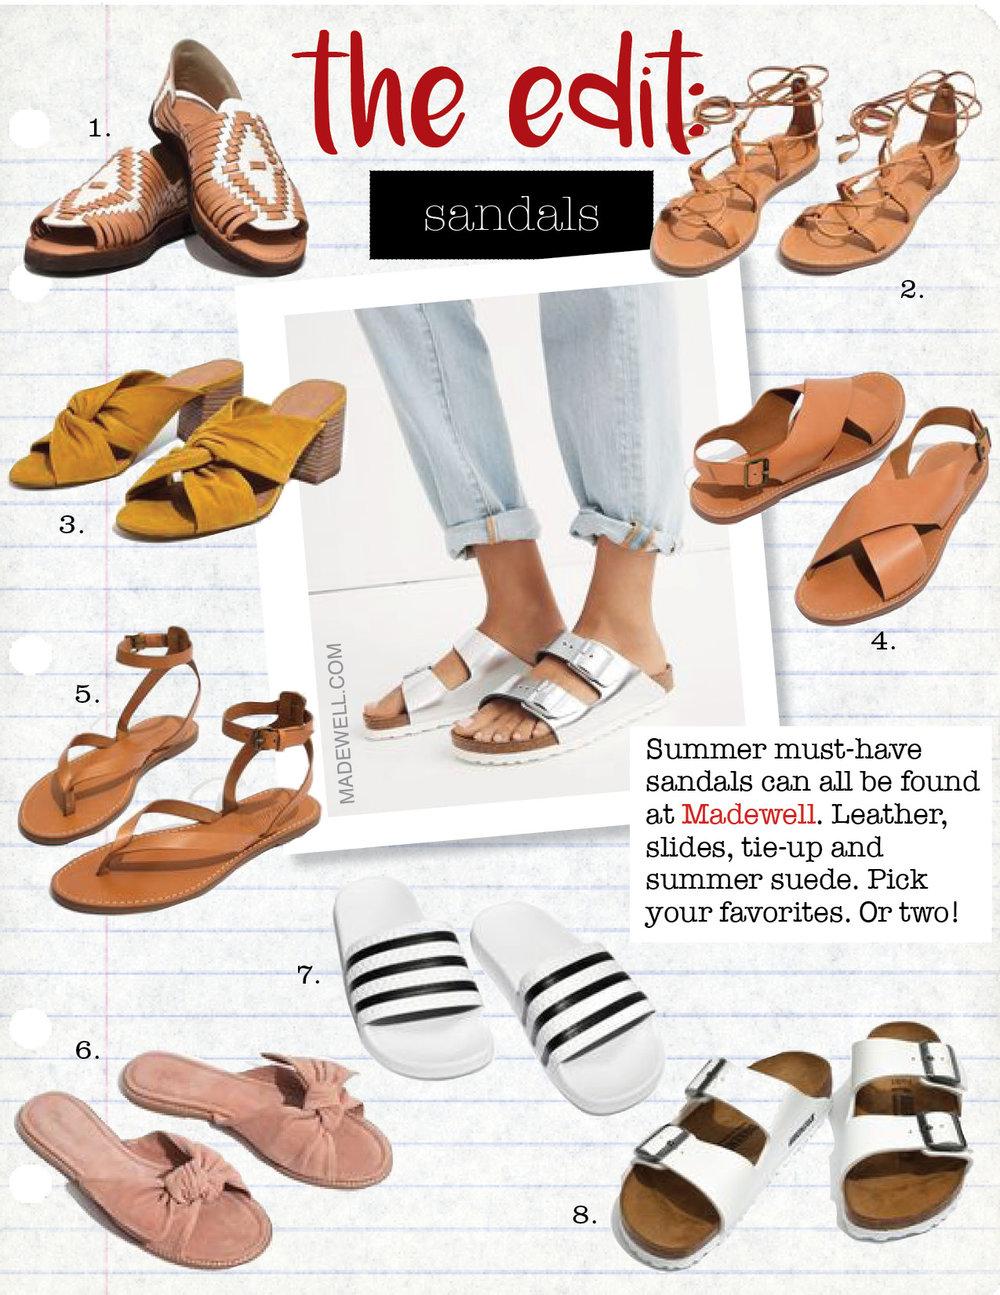 1. chamula classic uxmal huarache sandals, $81,  madewell.com  2. madewell boardwalk lace-up sandal, $59,  madewell.com  3. madewell sari crisscross sandal, $128,  madewell.com  4. madewell boardwalk crossover sandal, $59,  madewell.com  5. madewell boardwalk thong sandal, $59,  madewell.com  6. madewell naida half-bow sandal, $98,  madewell.com  7. adidas unisex adilette slides, $45,  madewell.com  8. birkenstock arizona sandals in white birko-flor, $135,  madewell.com